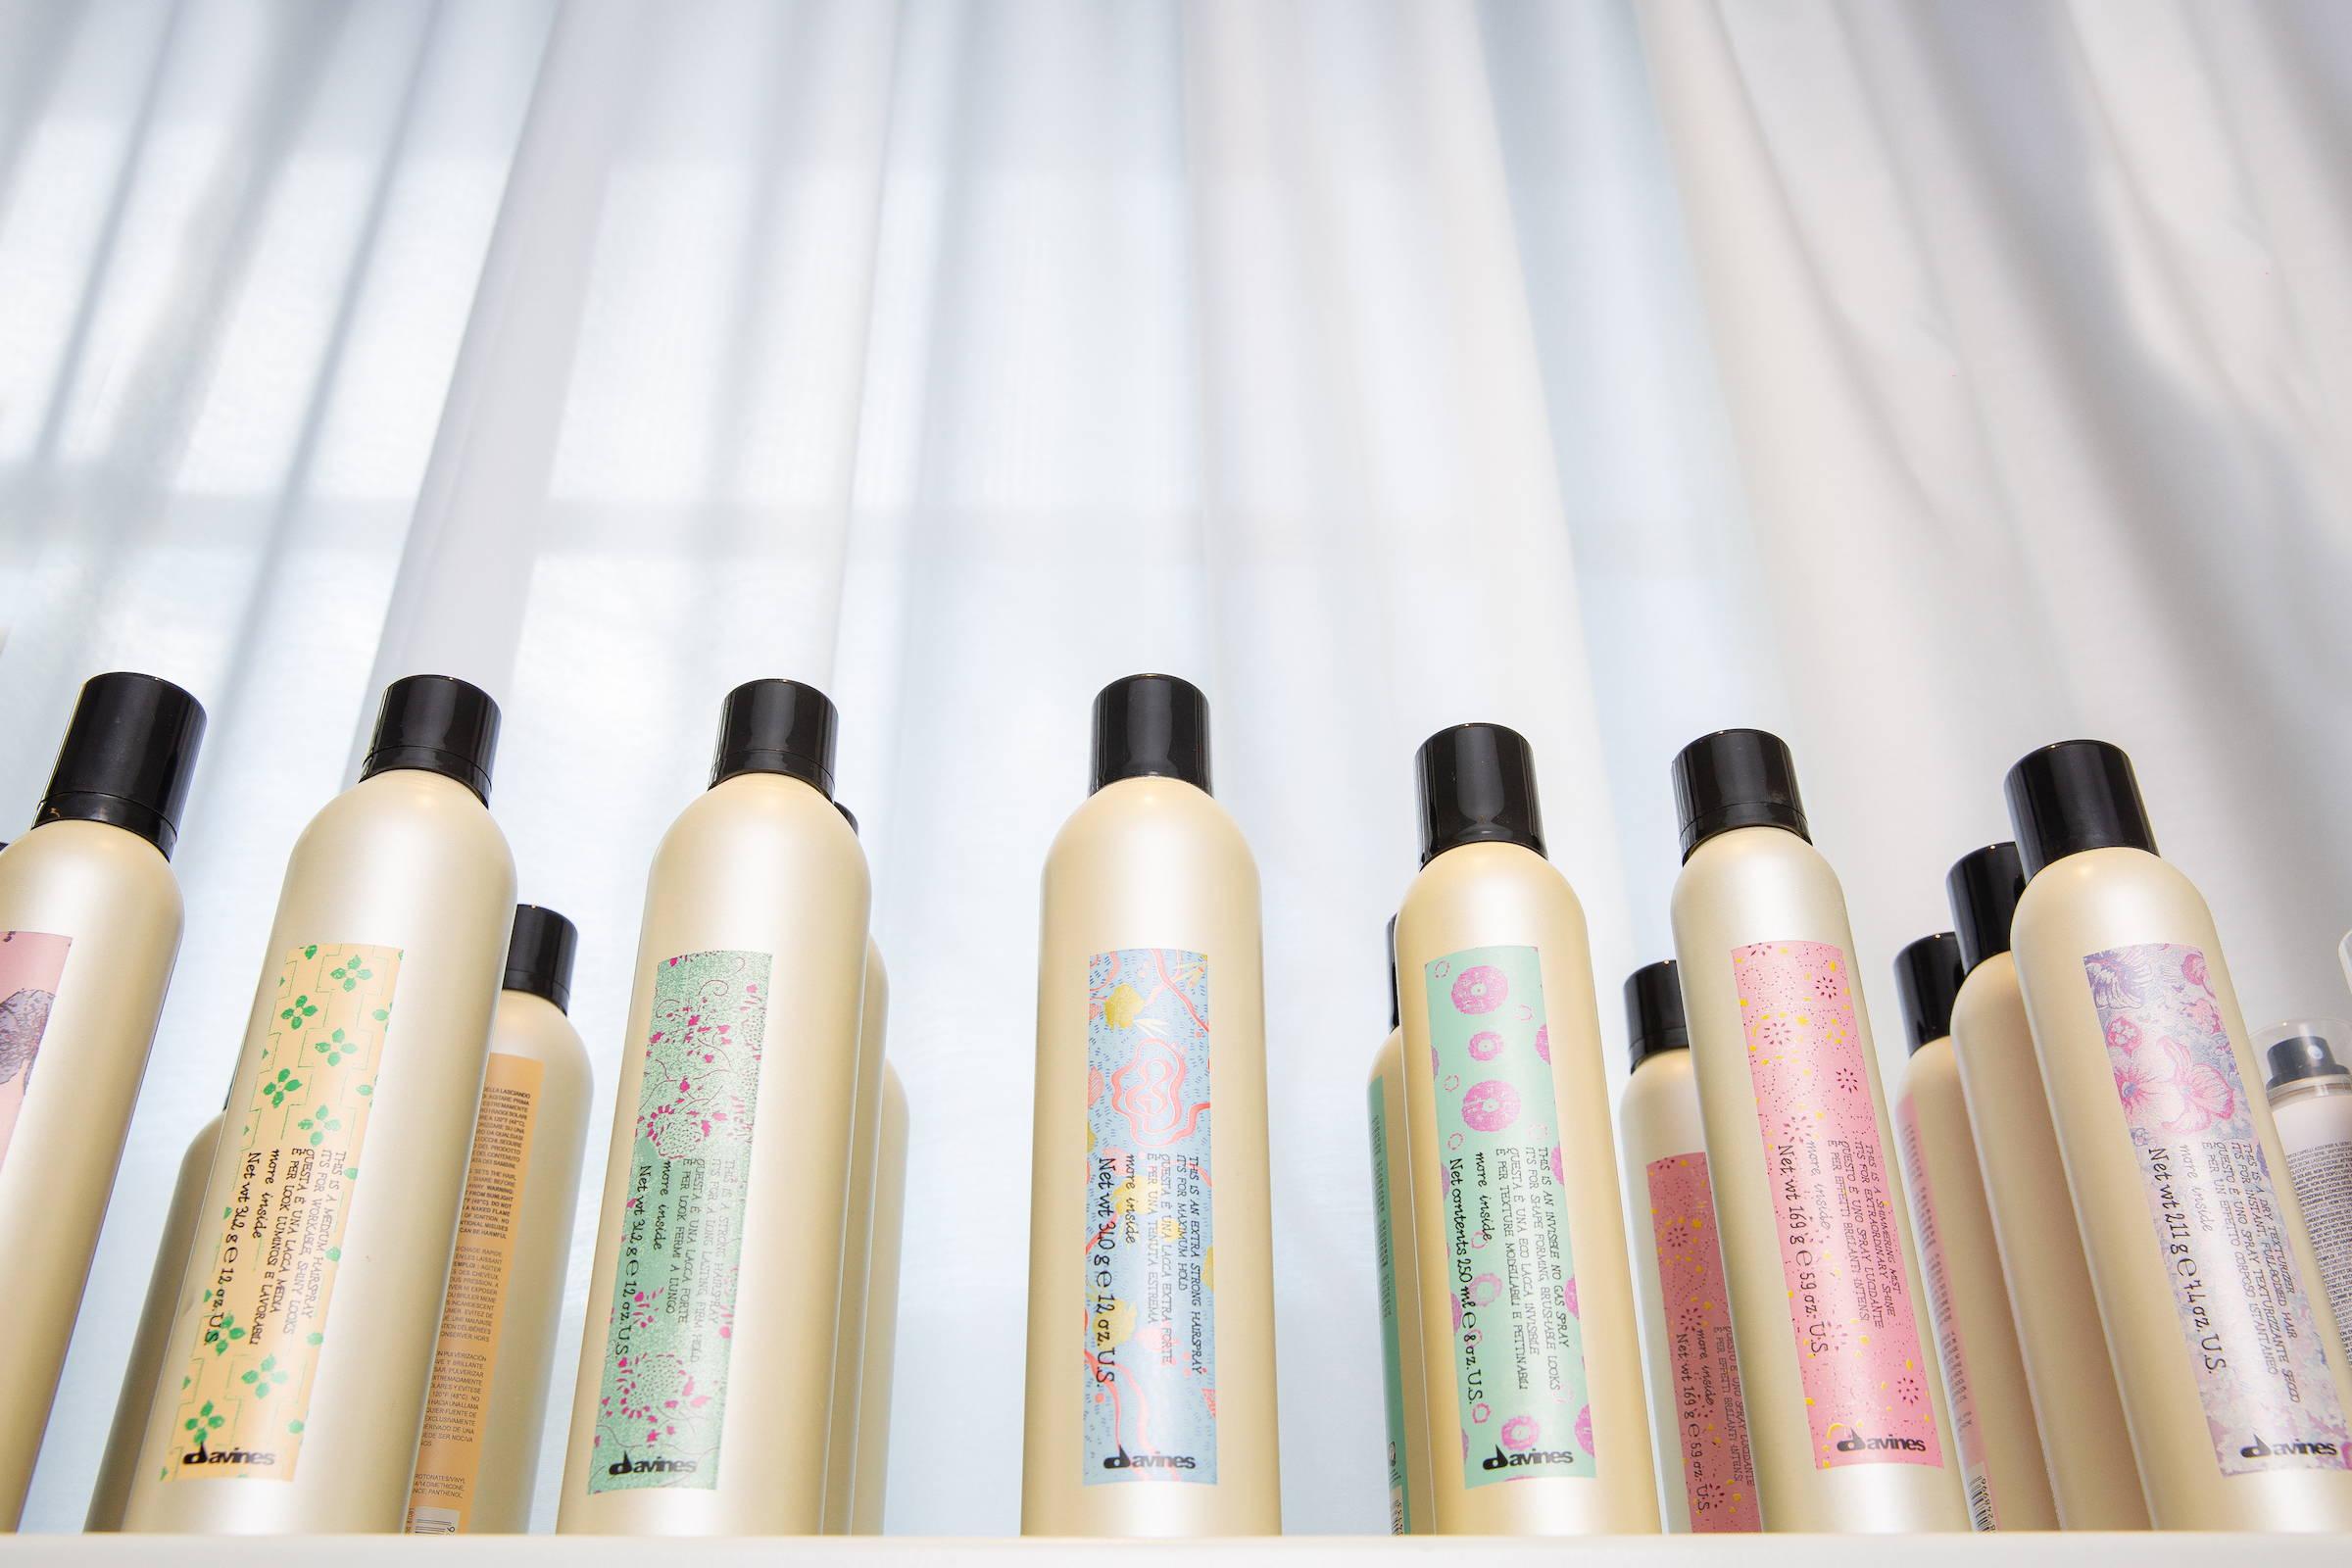 Davines styling product aerosol how to shag hair